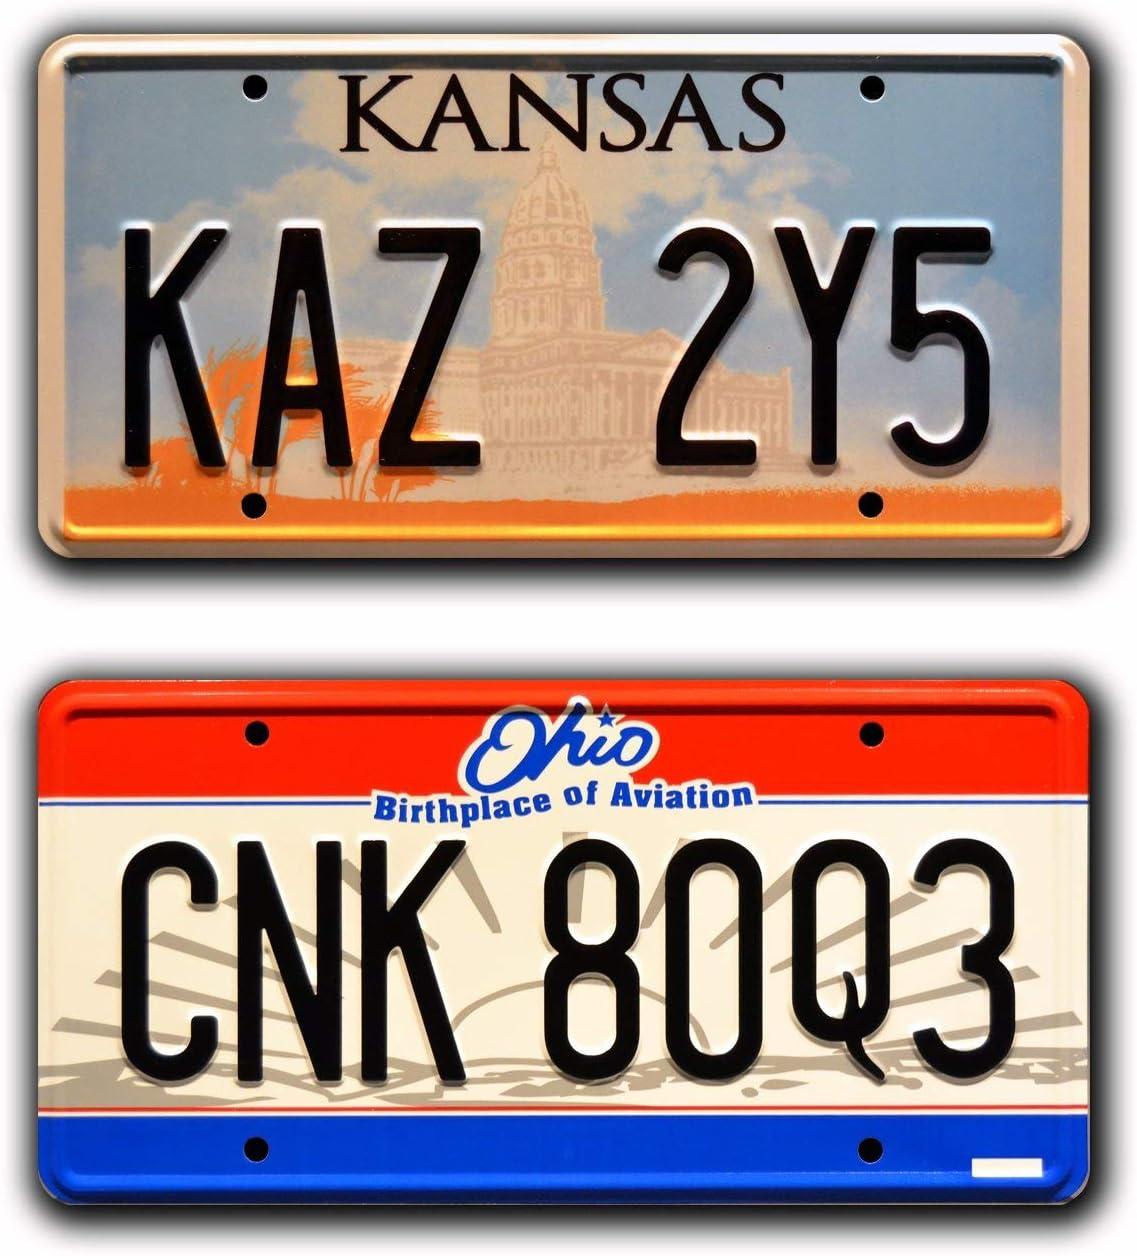 Metal Stamped Vanity Prop License Plate Supernatural CNK 80Q3 Dean Winchester/'s Metallicar